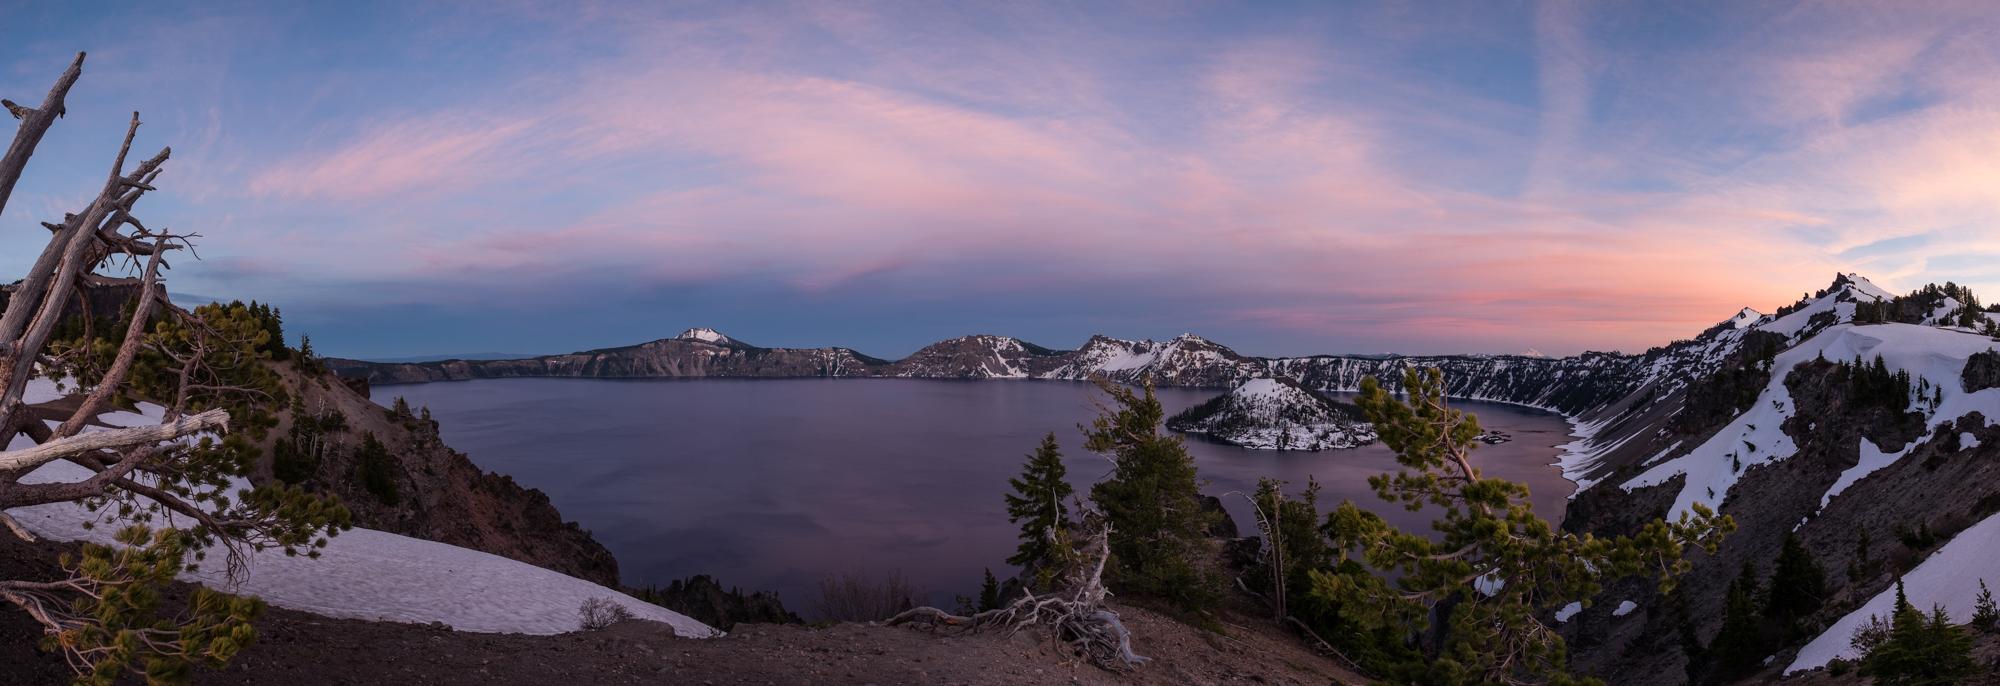 Crater Lake National Park - 043.jpg